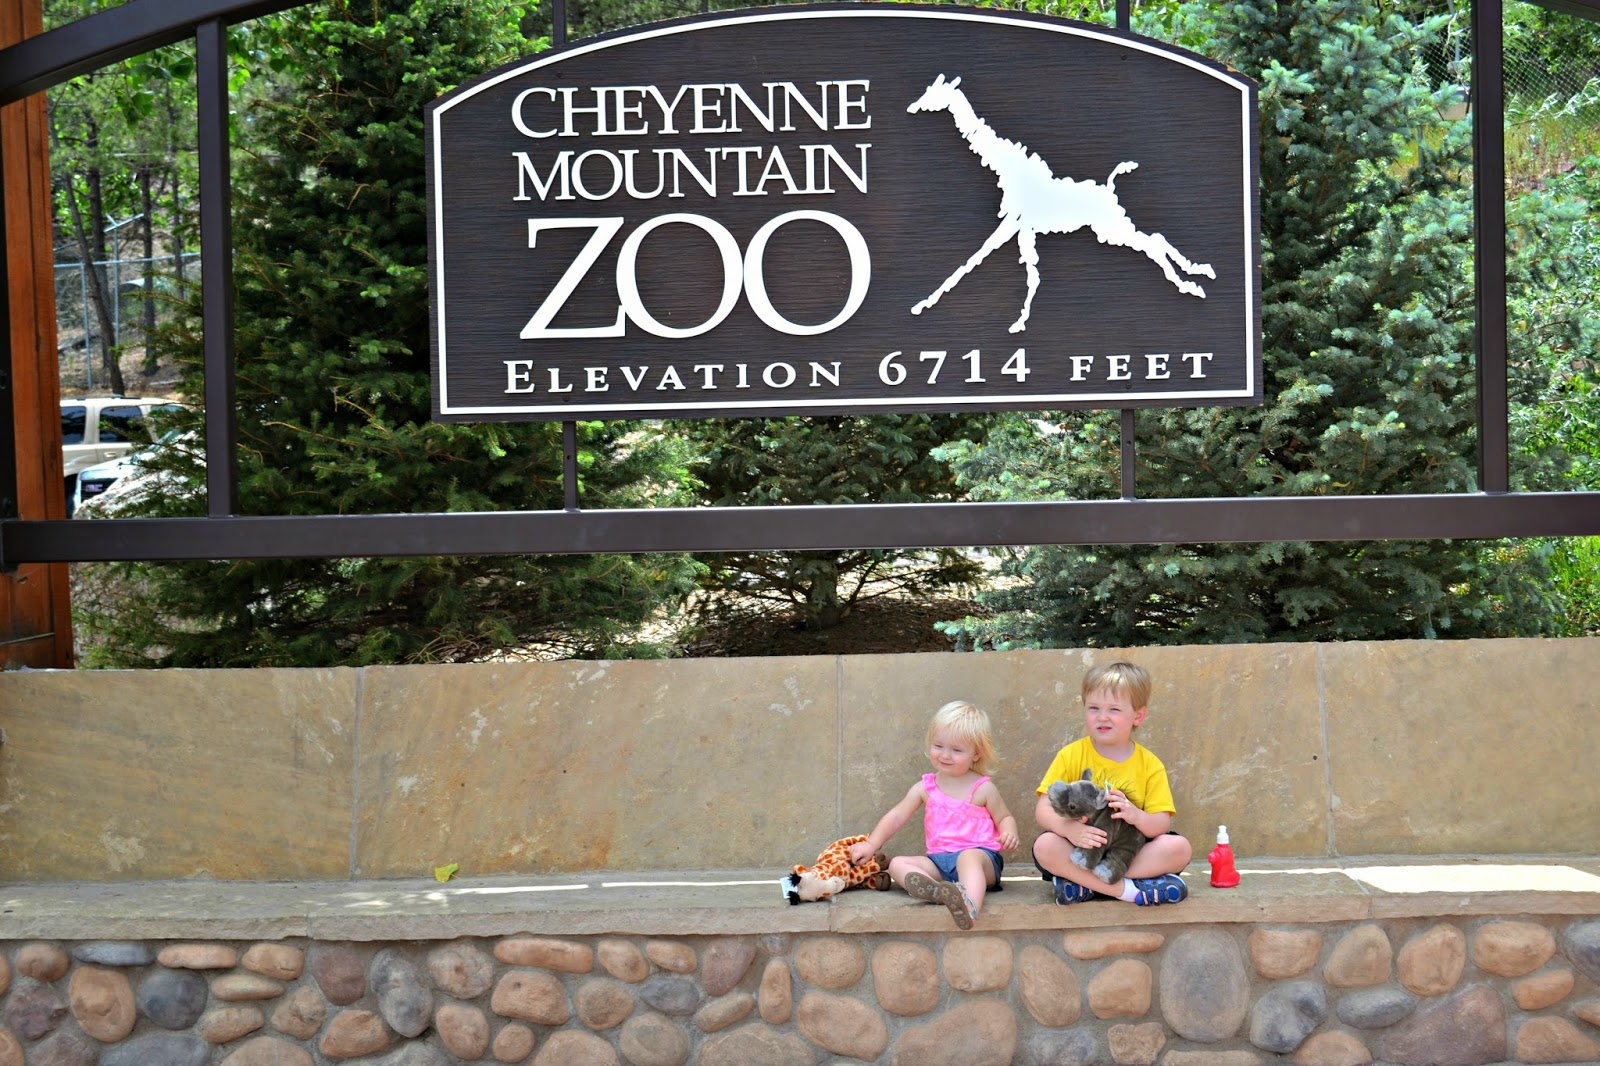 cheyenne mountain zoo colorado springs colorado building our story. Black Bedroom Furniture Sets. Home Design Ideas